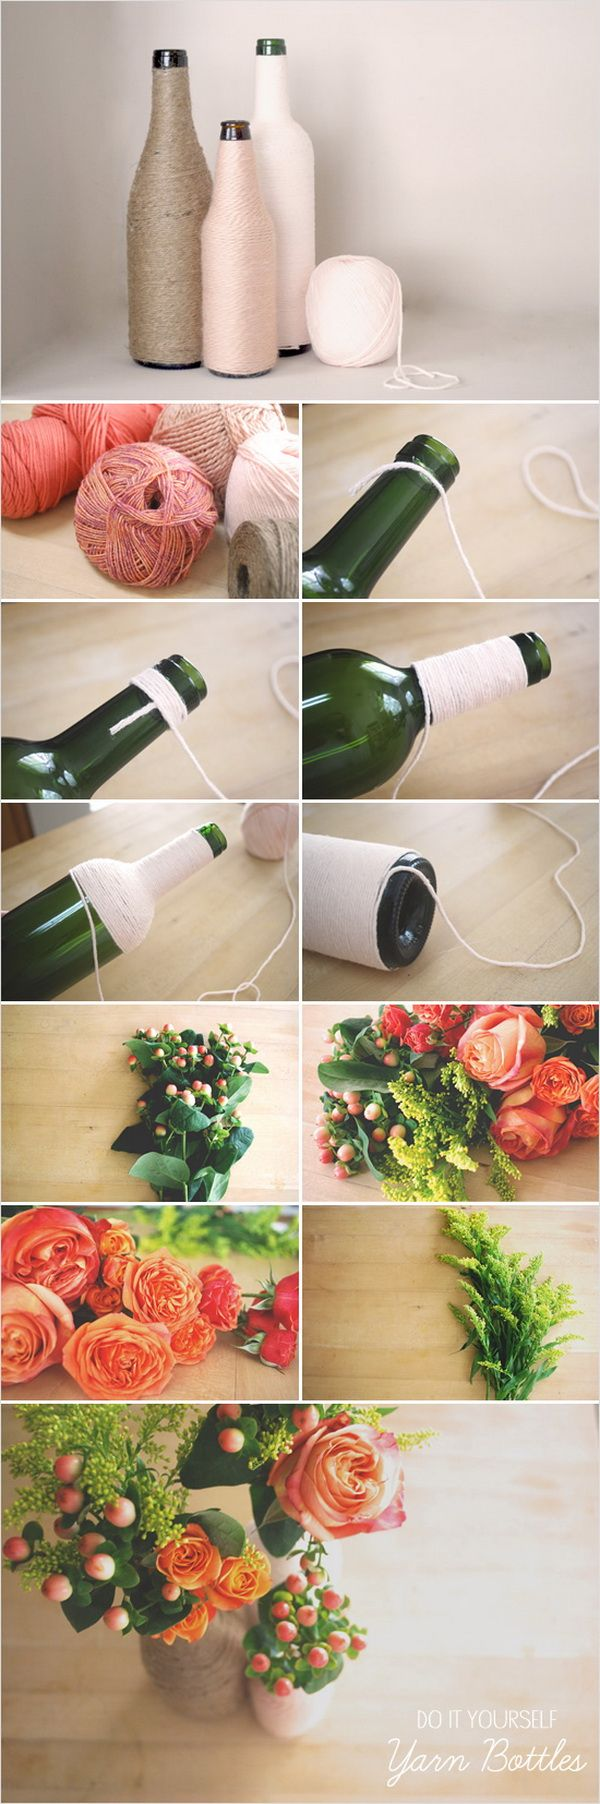 DIY yarn wraped bottles for wedding centerpieces 2015